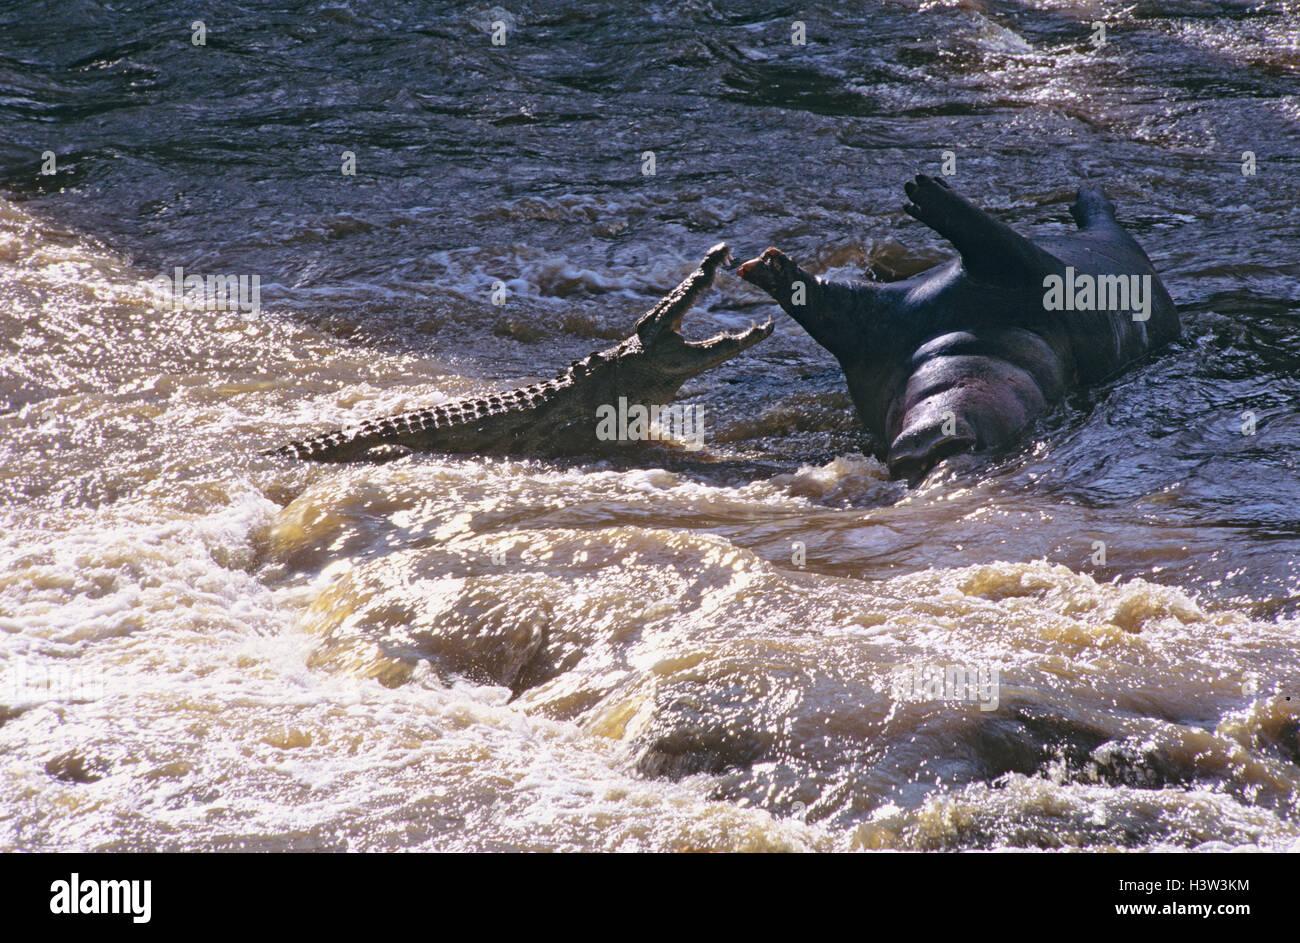 Nile crocodile (Crocodylus niloticus) - Stock Image